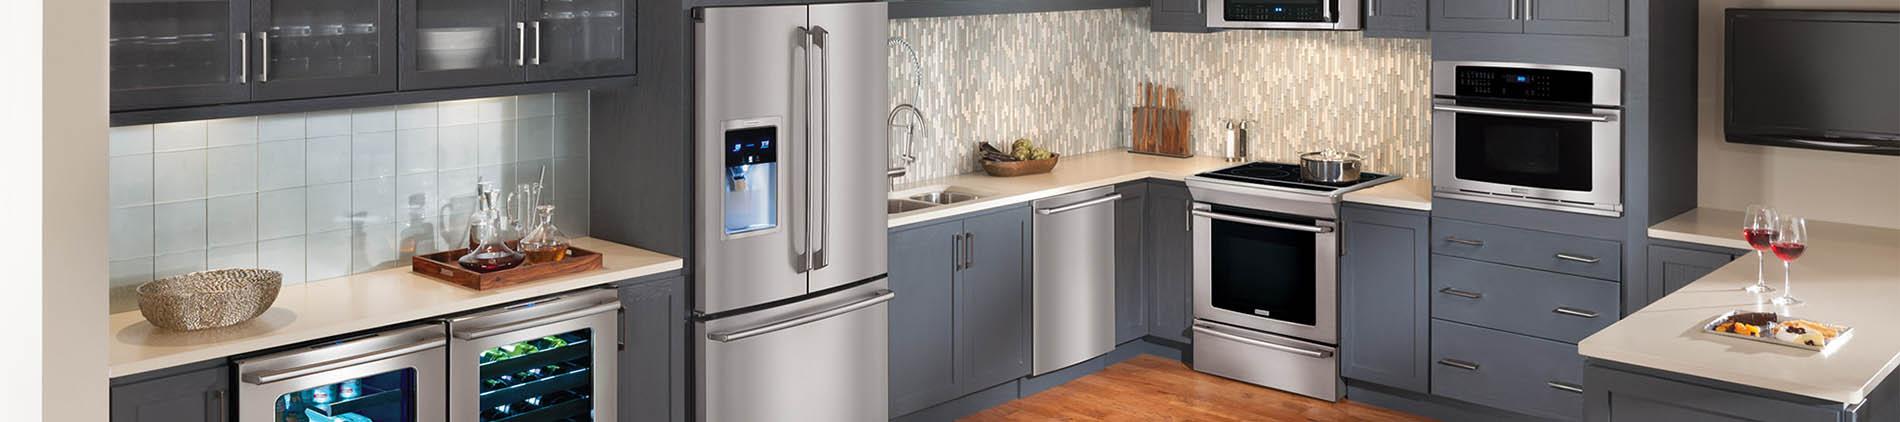 Stainless, Kitchen, Frigidaire, Wall Oven, Range, Dishwasher, wine cooler, Fridge